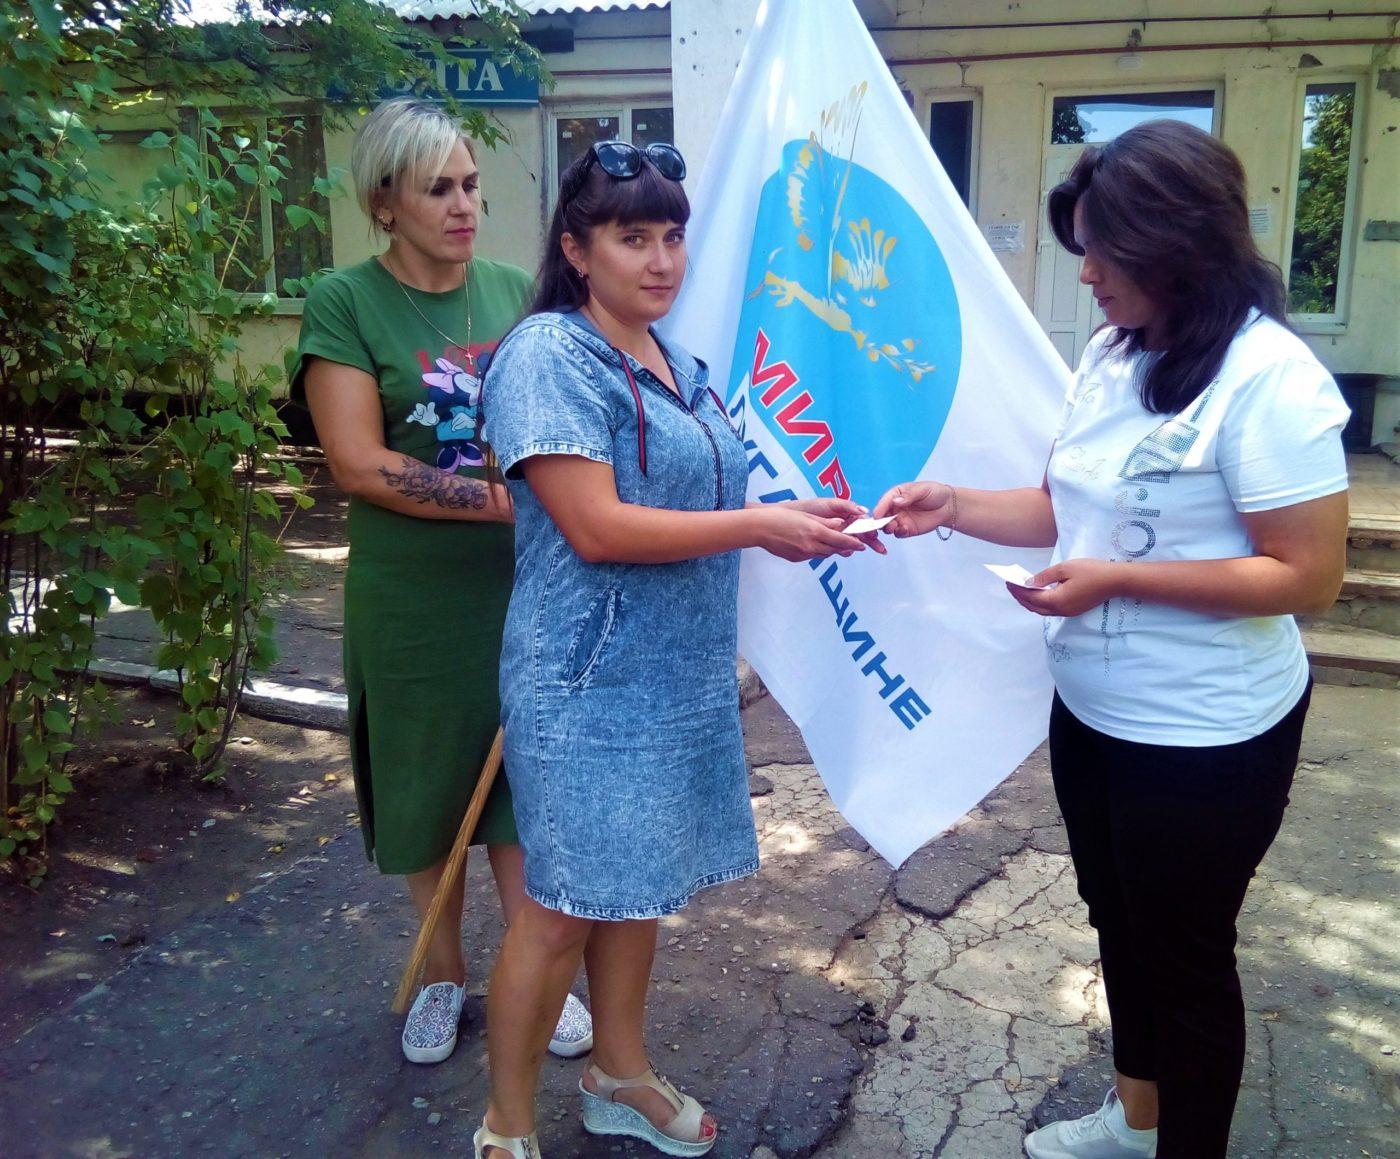 Краснодонские активисты продолжают реализацию акции «Стоп, наркотикам!»